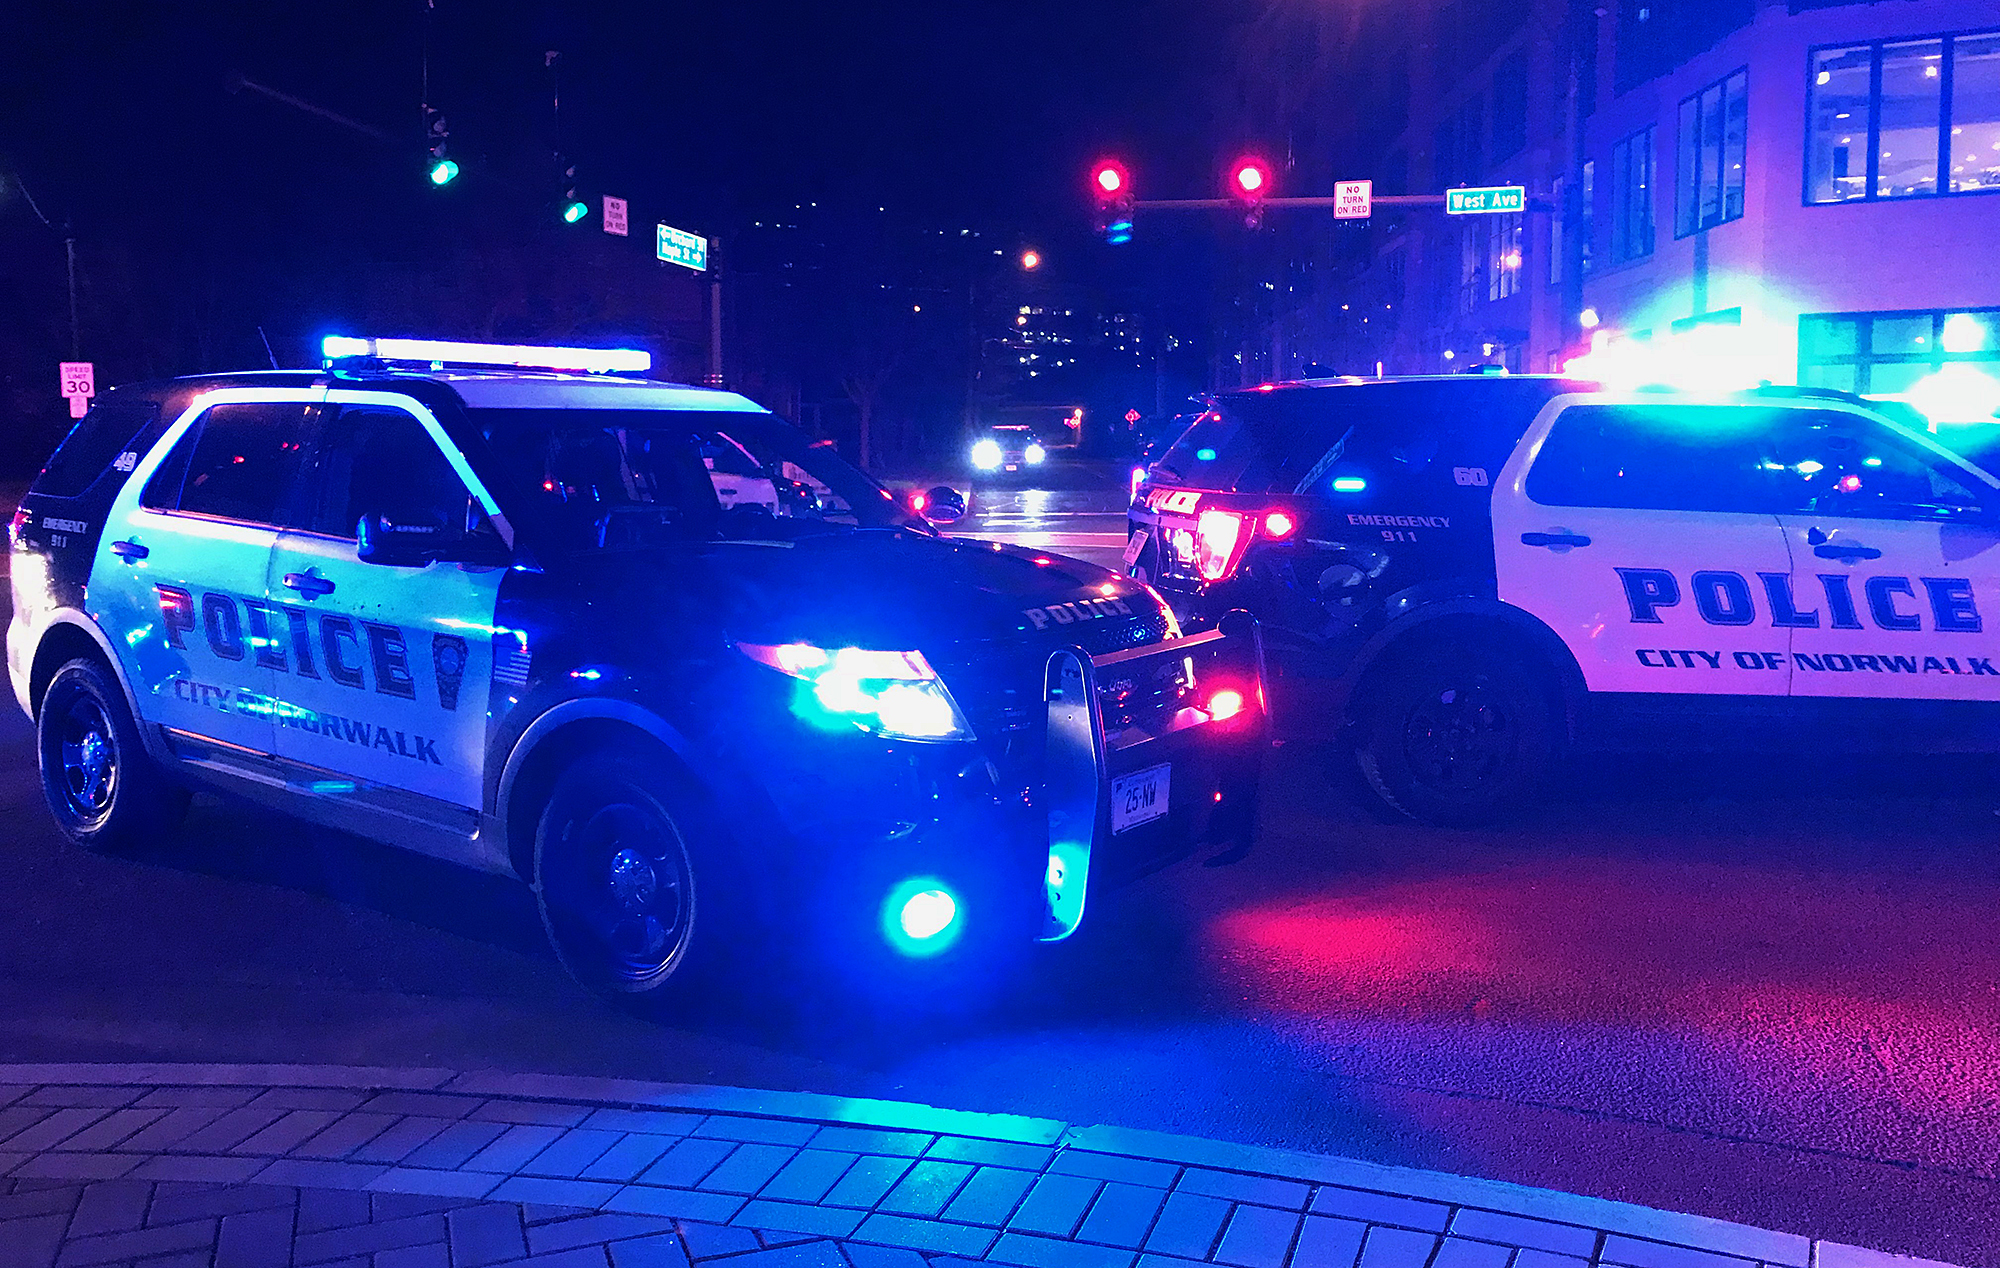 Norwalk Council authorizes 'menacing' police vehicles